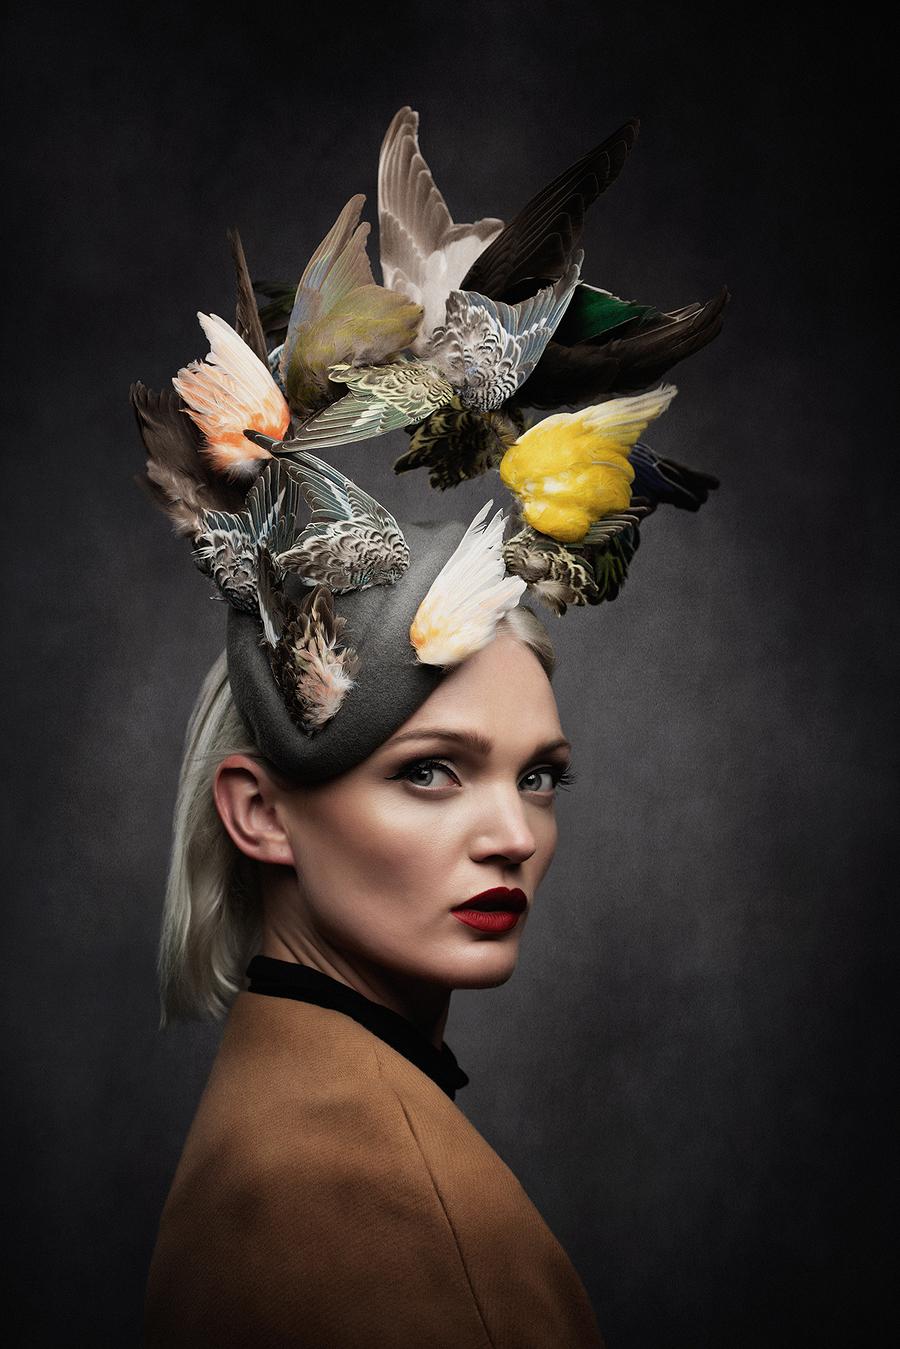 The Birds / Photography by Gazhilla, Model Katie Willy, Post processing by Gazhilla, Stylist Gazhilla / Uploaded 24th September 2020 @ 06:57 PM